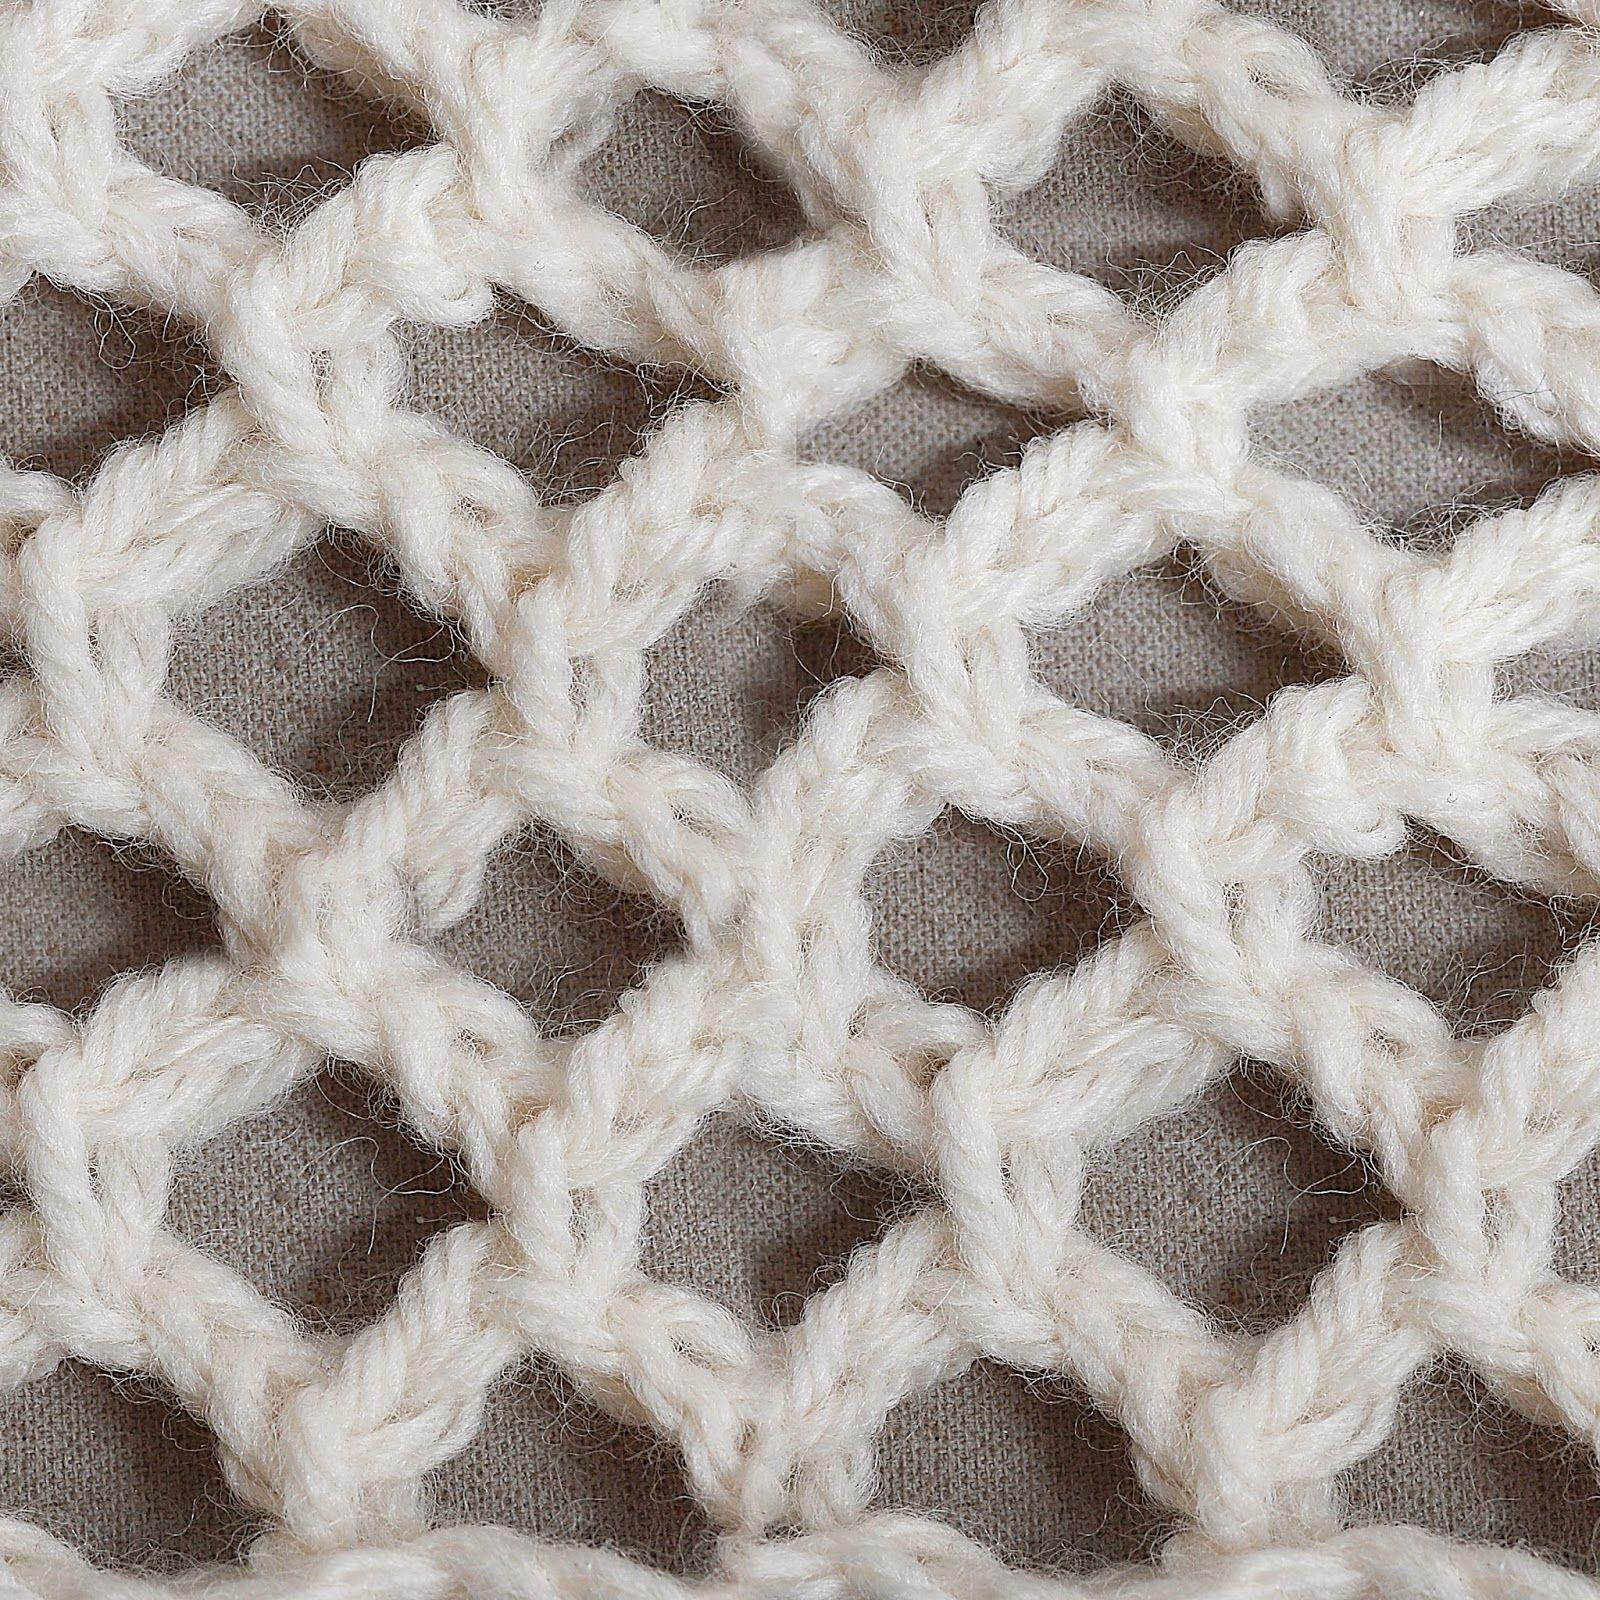 My Tunisian Crochet: Tunisian Mesh | Crochet técnica tunecino ...